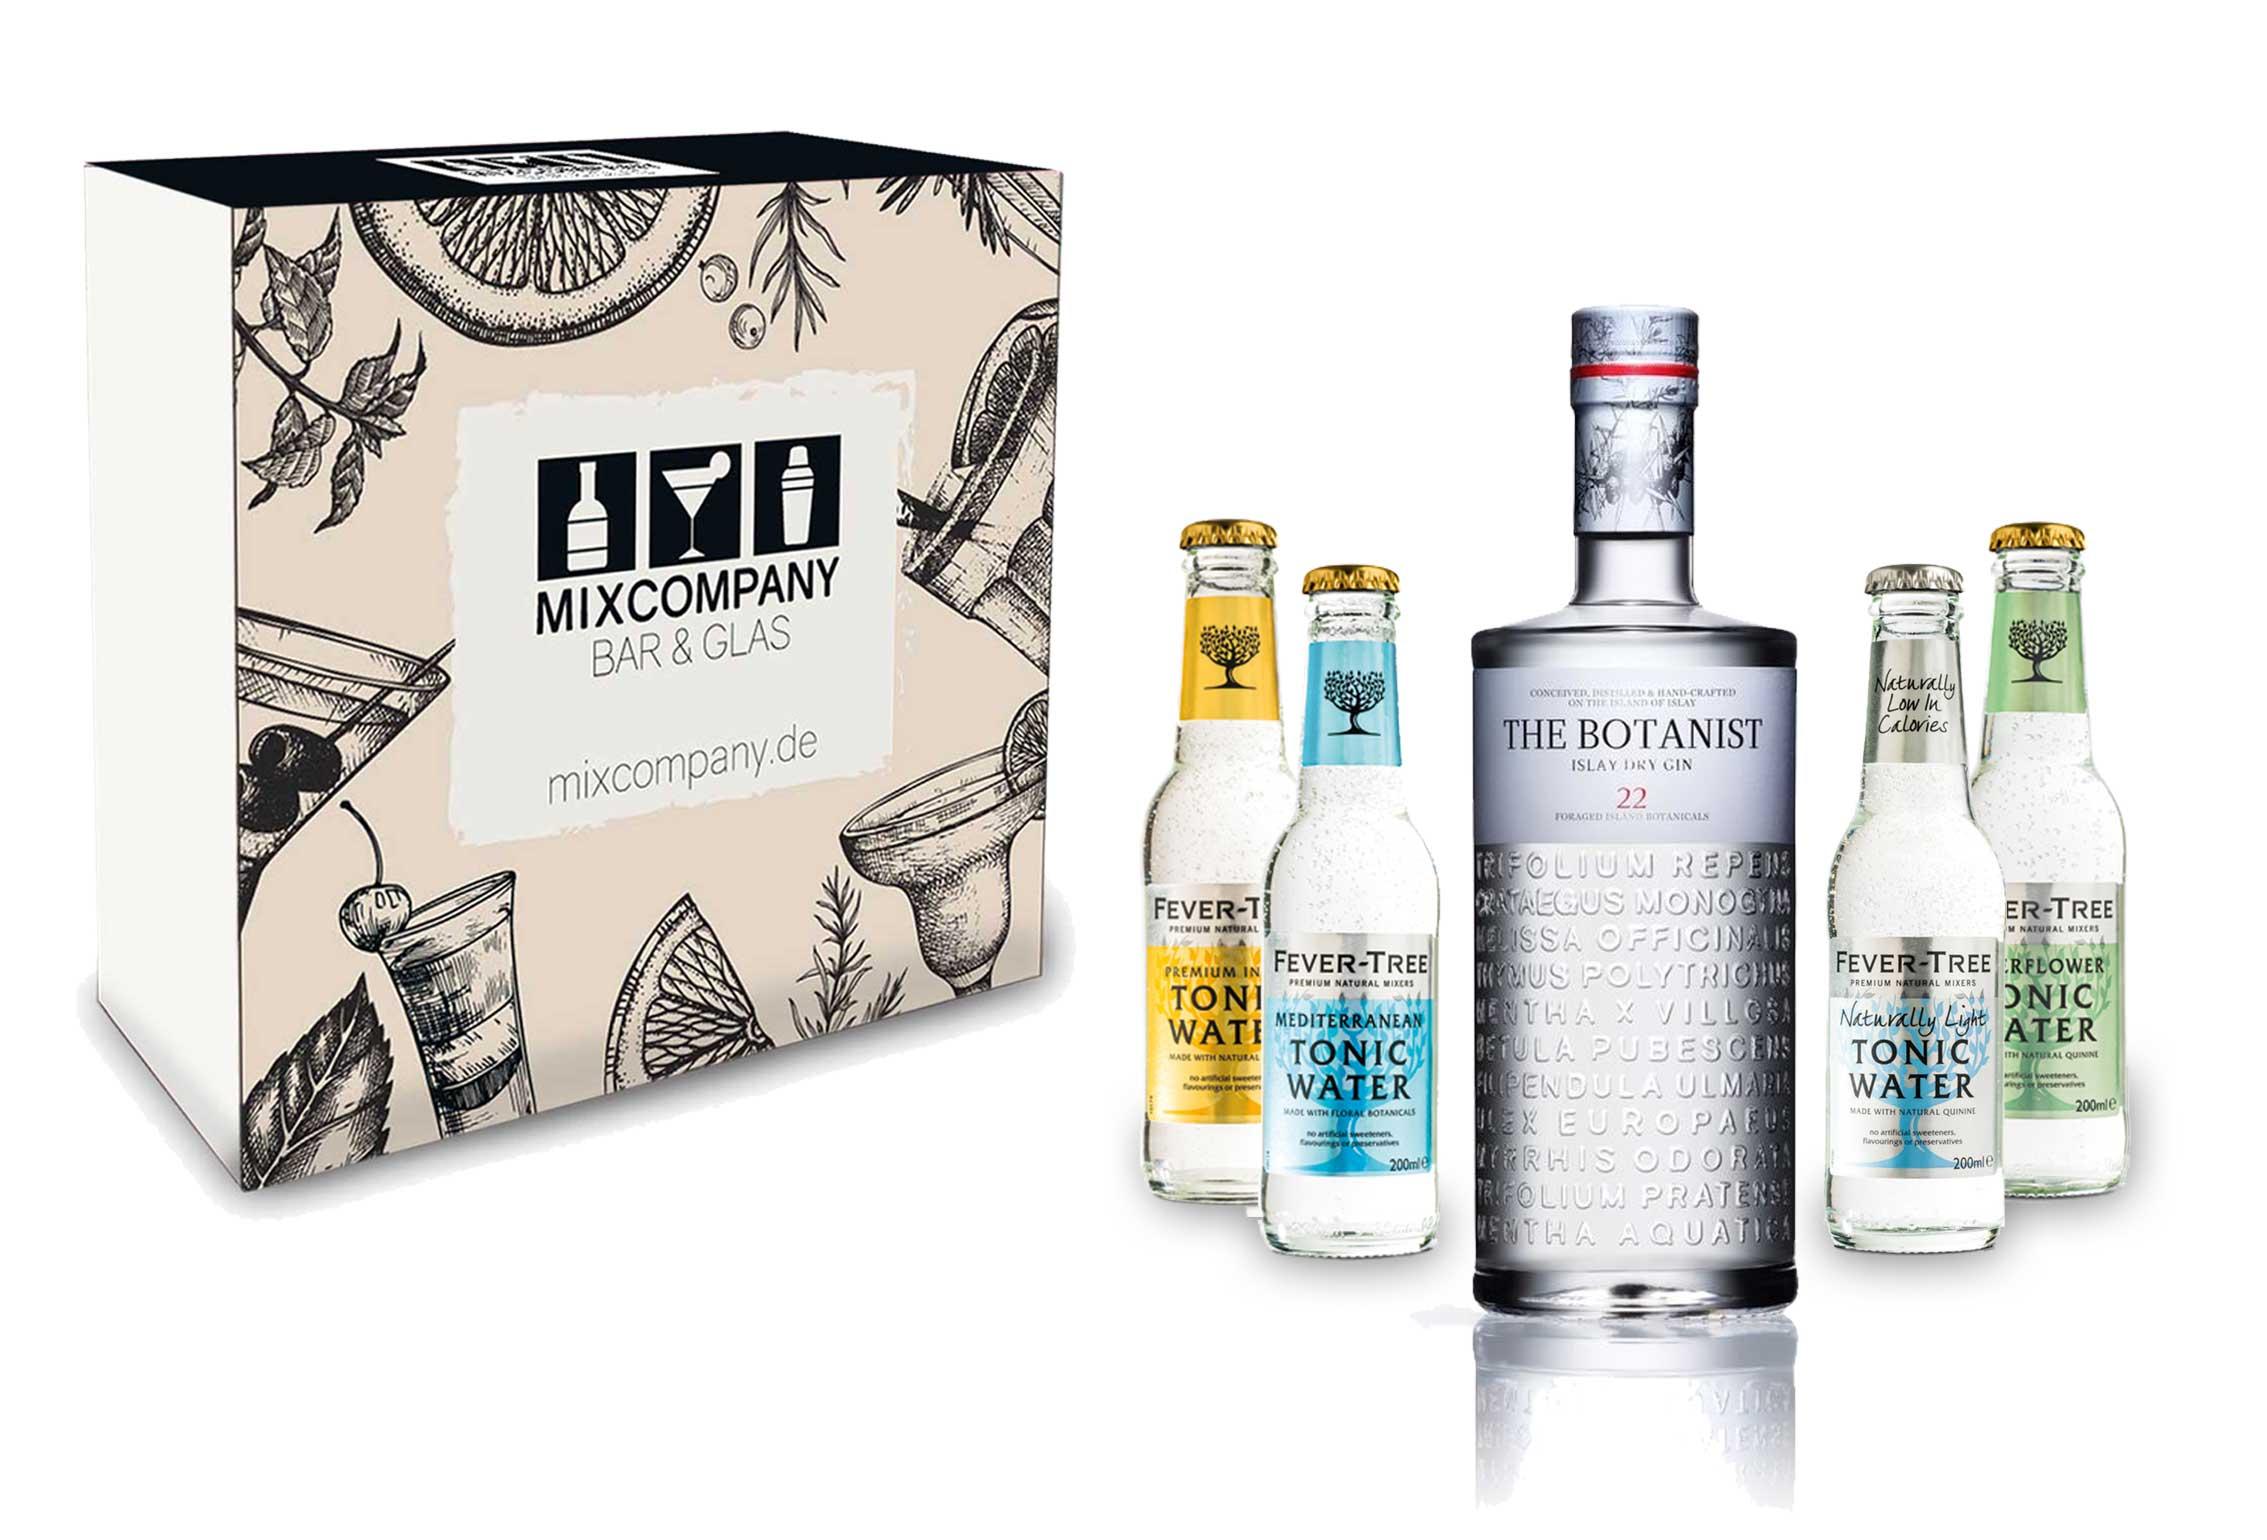 Gin Tonic Set Giftbox Geschenkset - The Botanist Islay Dry Gin 0,7l 700ml (46% Vol) + 4x Fever Tree Tonic Water Mix je 200ml inkl. Pfand MEHRWEG -[Enthält Sulfite]